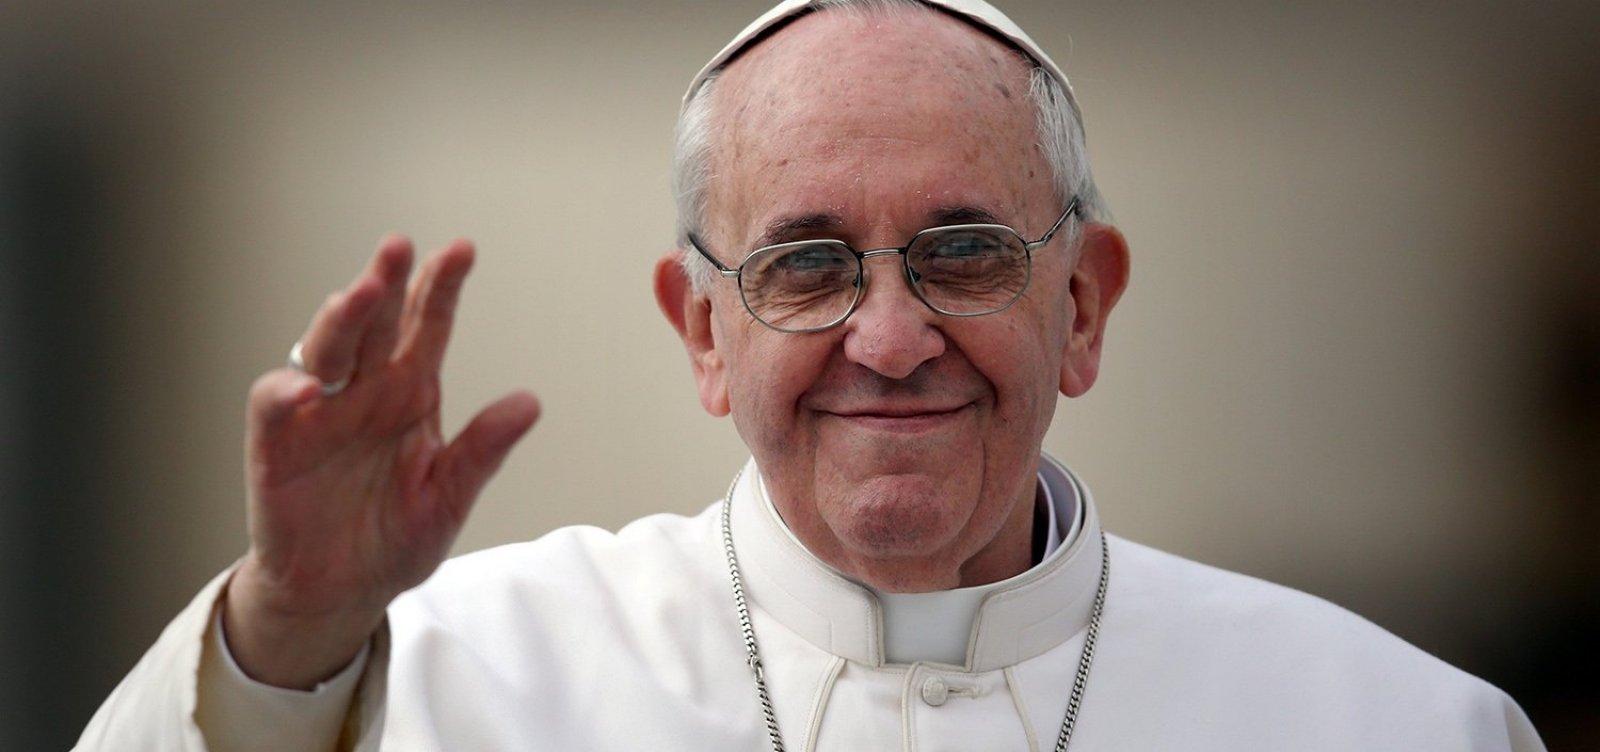 Papa Francisco aceita renúncia de dois bispos chilenos por pedofilia